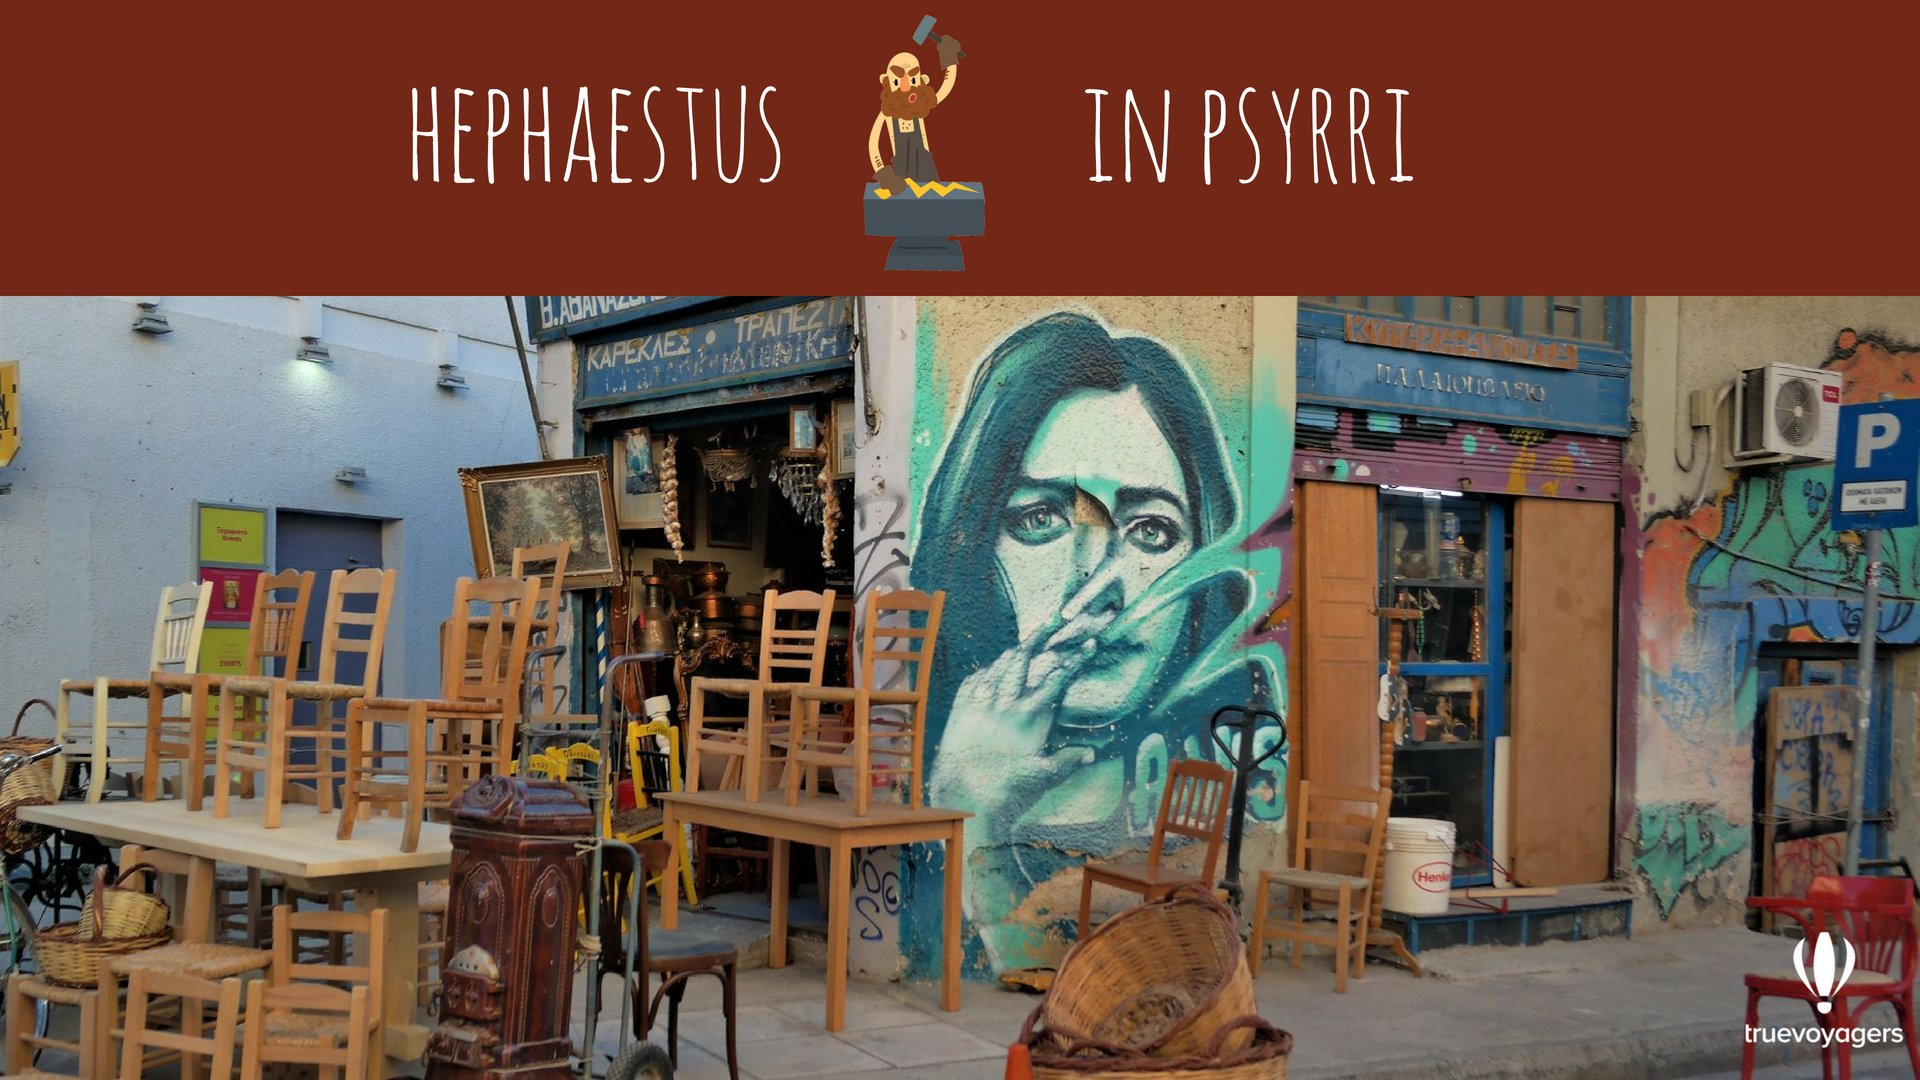 Hephaestus in Psyrri. Copyright: Truevoyagers